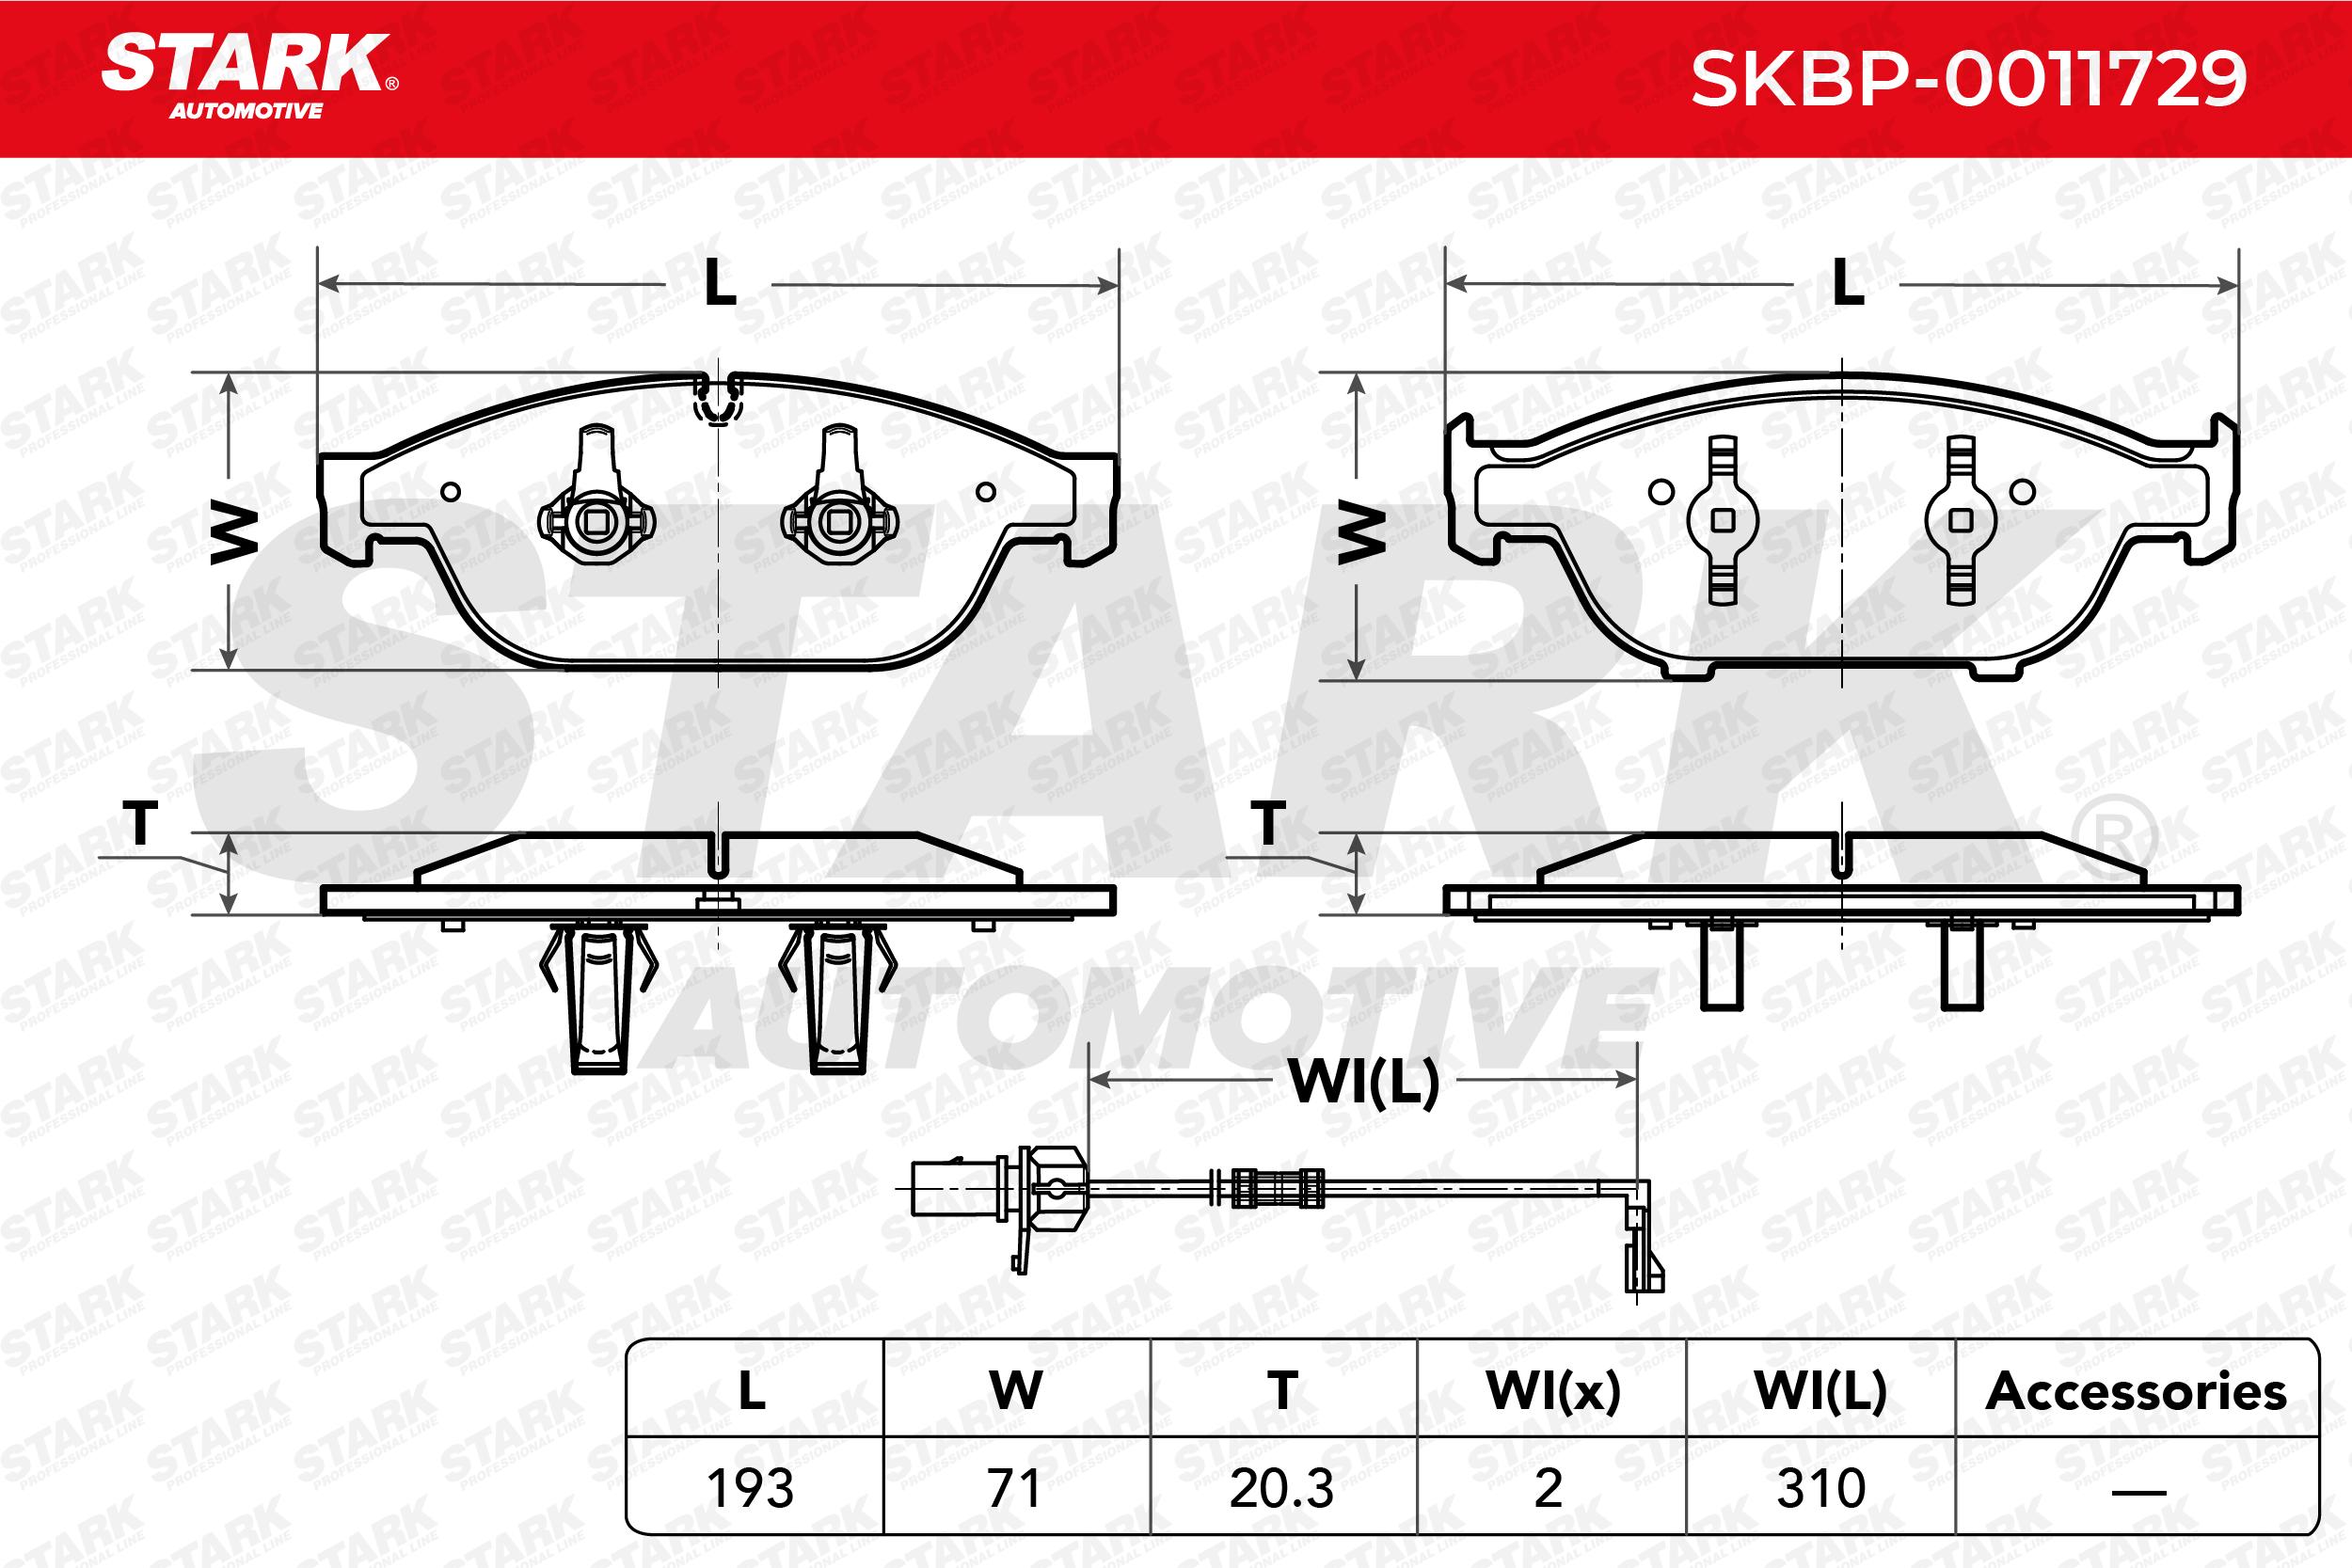 SKBP-0011729 STARK from manufacturer up to - 20% off!